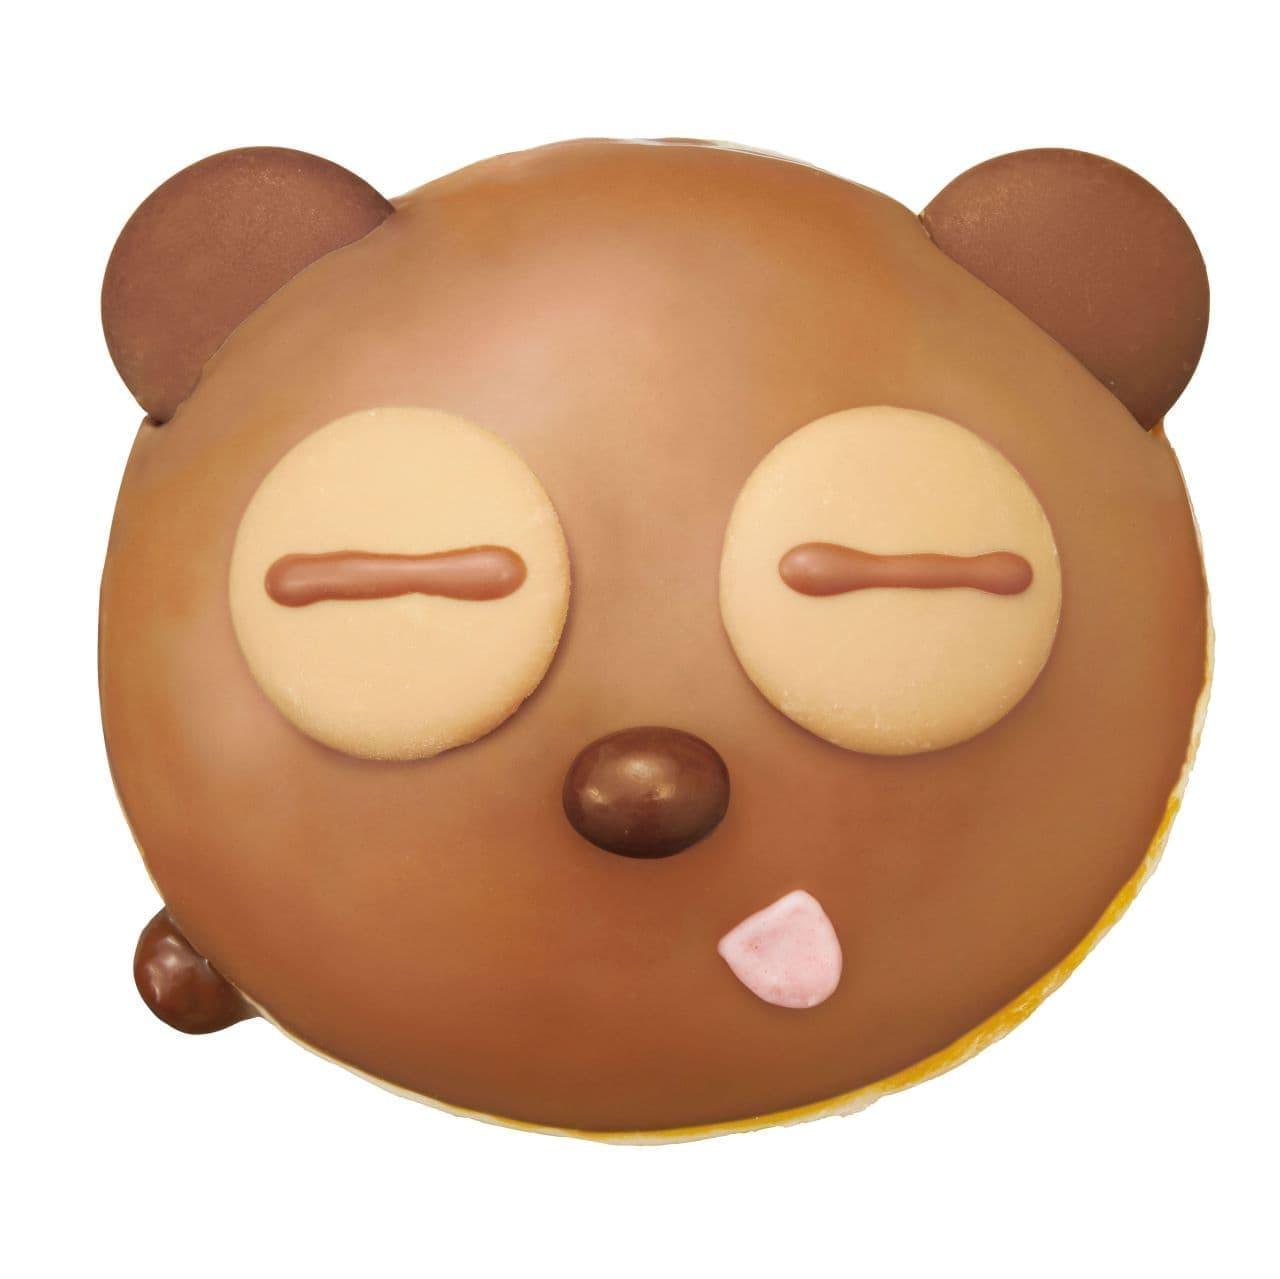 KKD×ミニオン「キャラメルチョコ ティム」